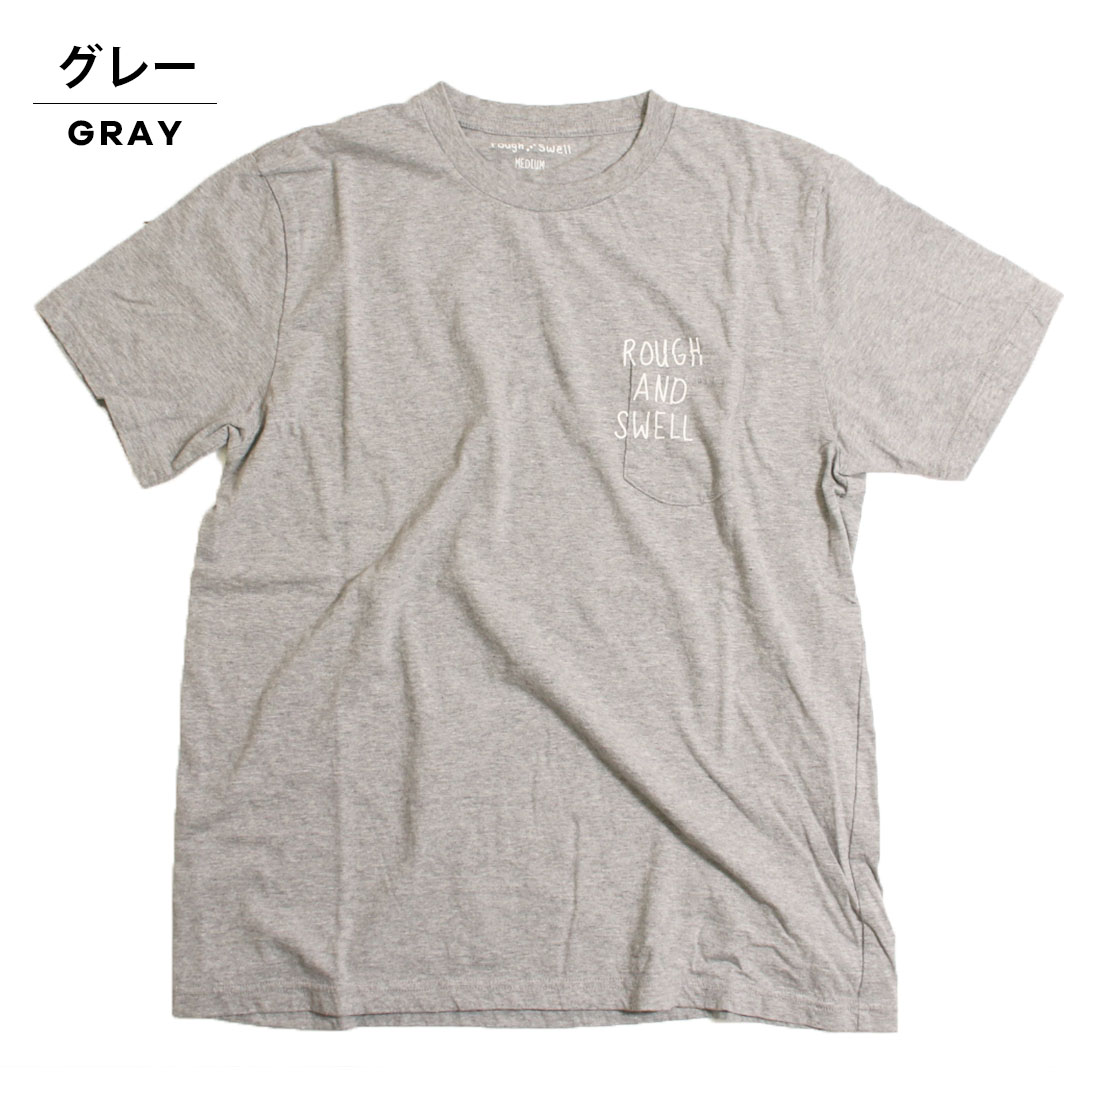 rough&swell ラフ&スウェル 【送料無料】 RS POCKET TEE(L)半袖Tシャツ メール便不可